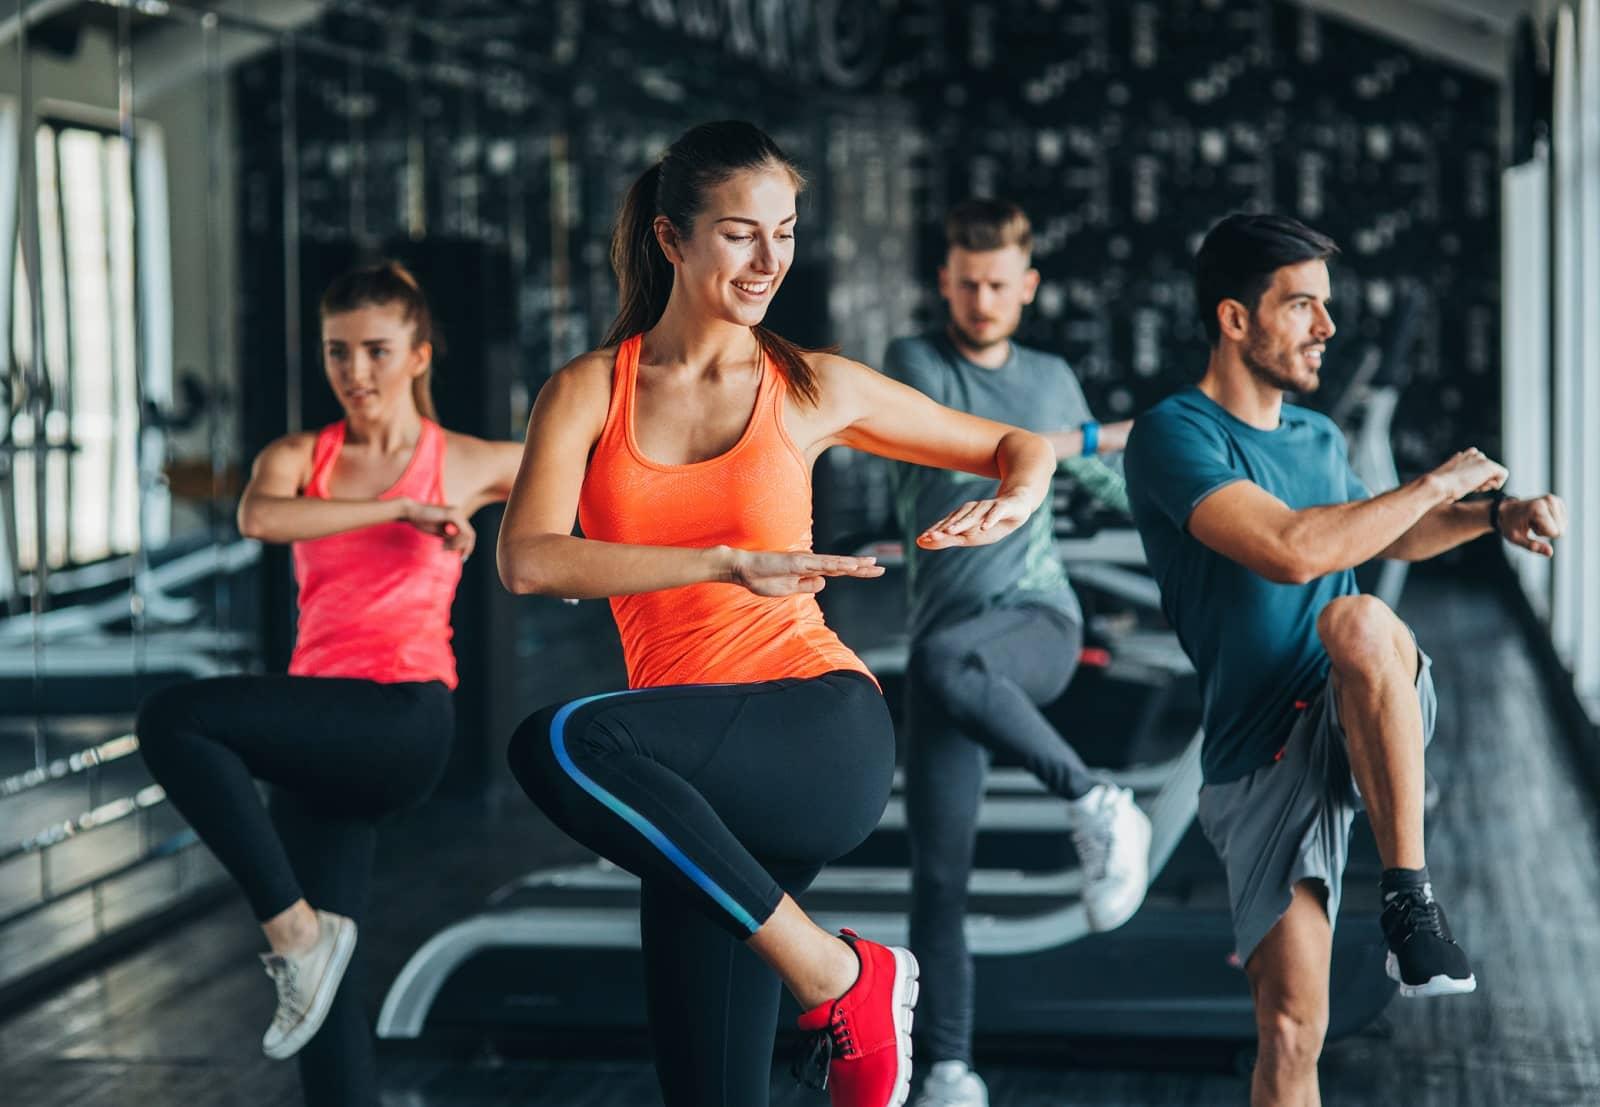 health club fitness class